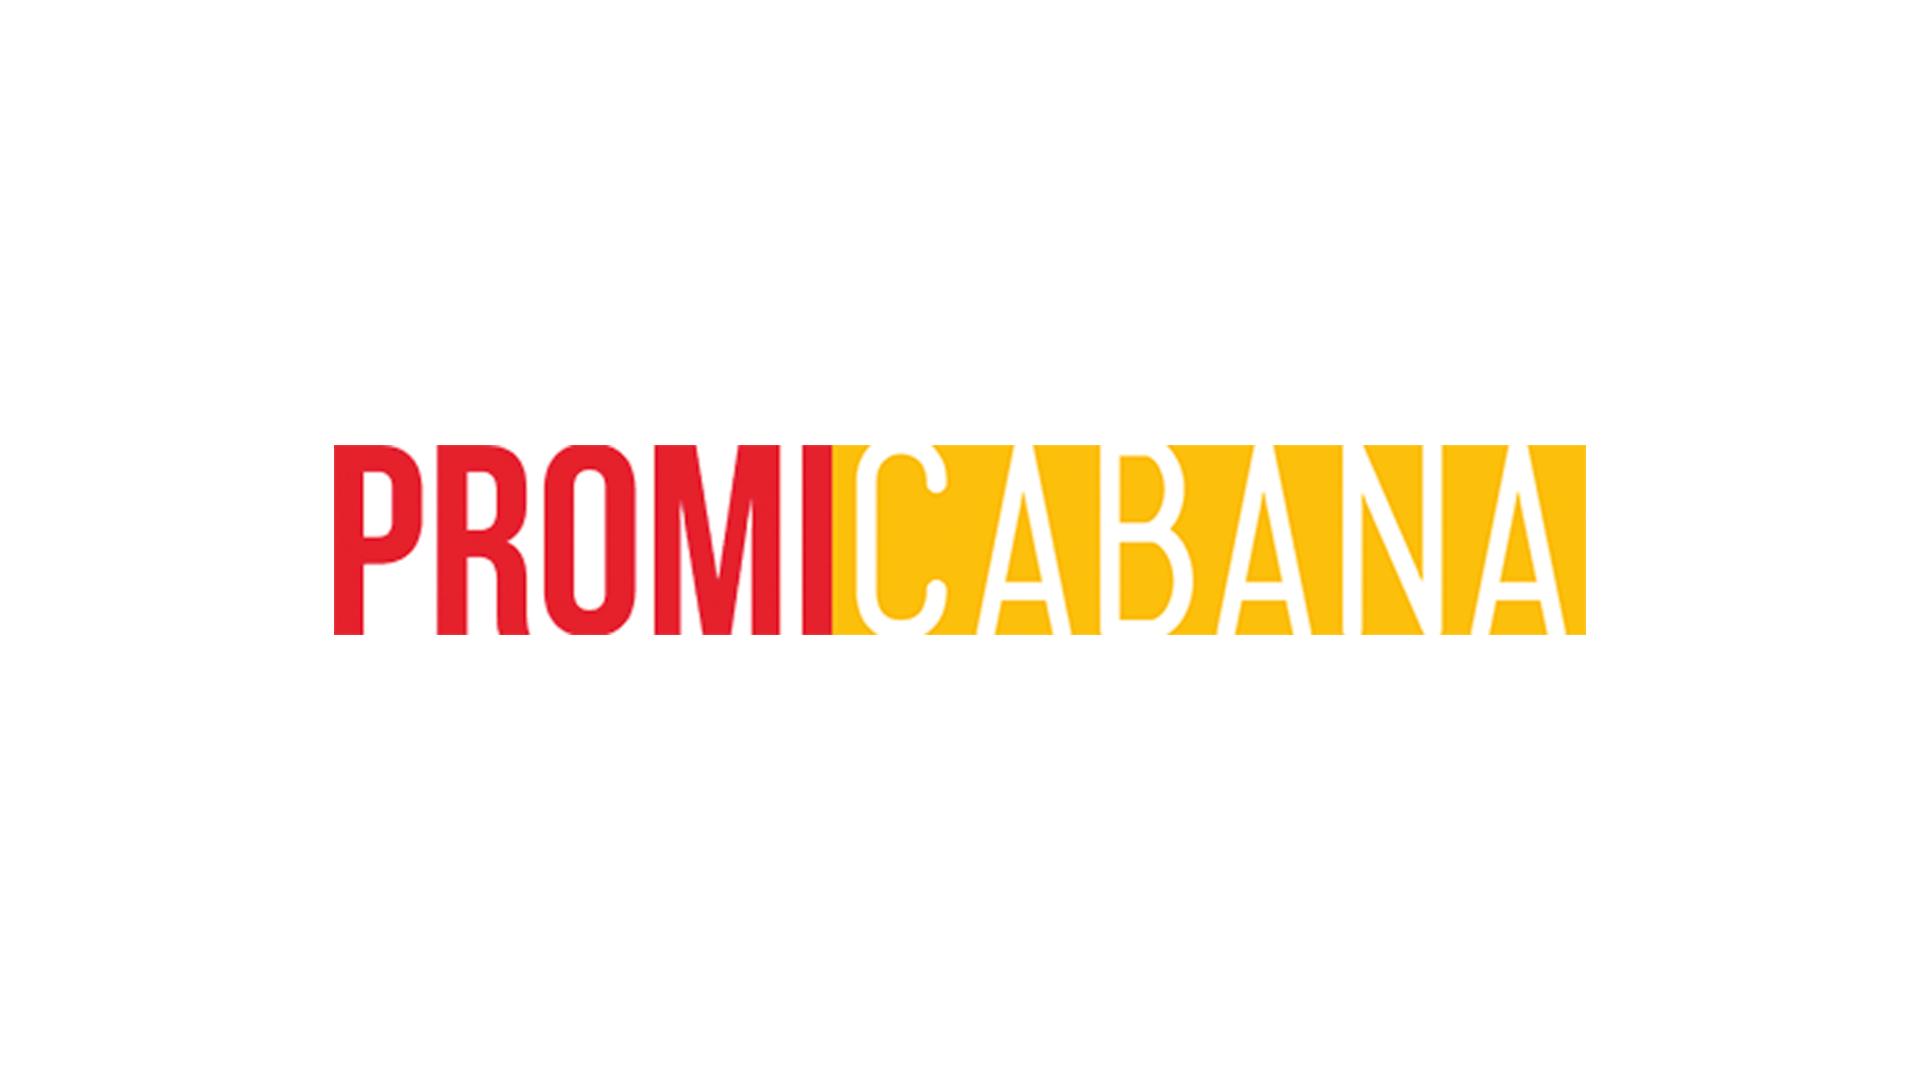 Hermine-Granger-Haus-2